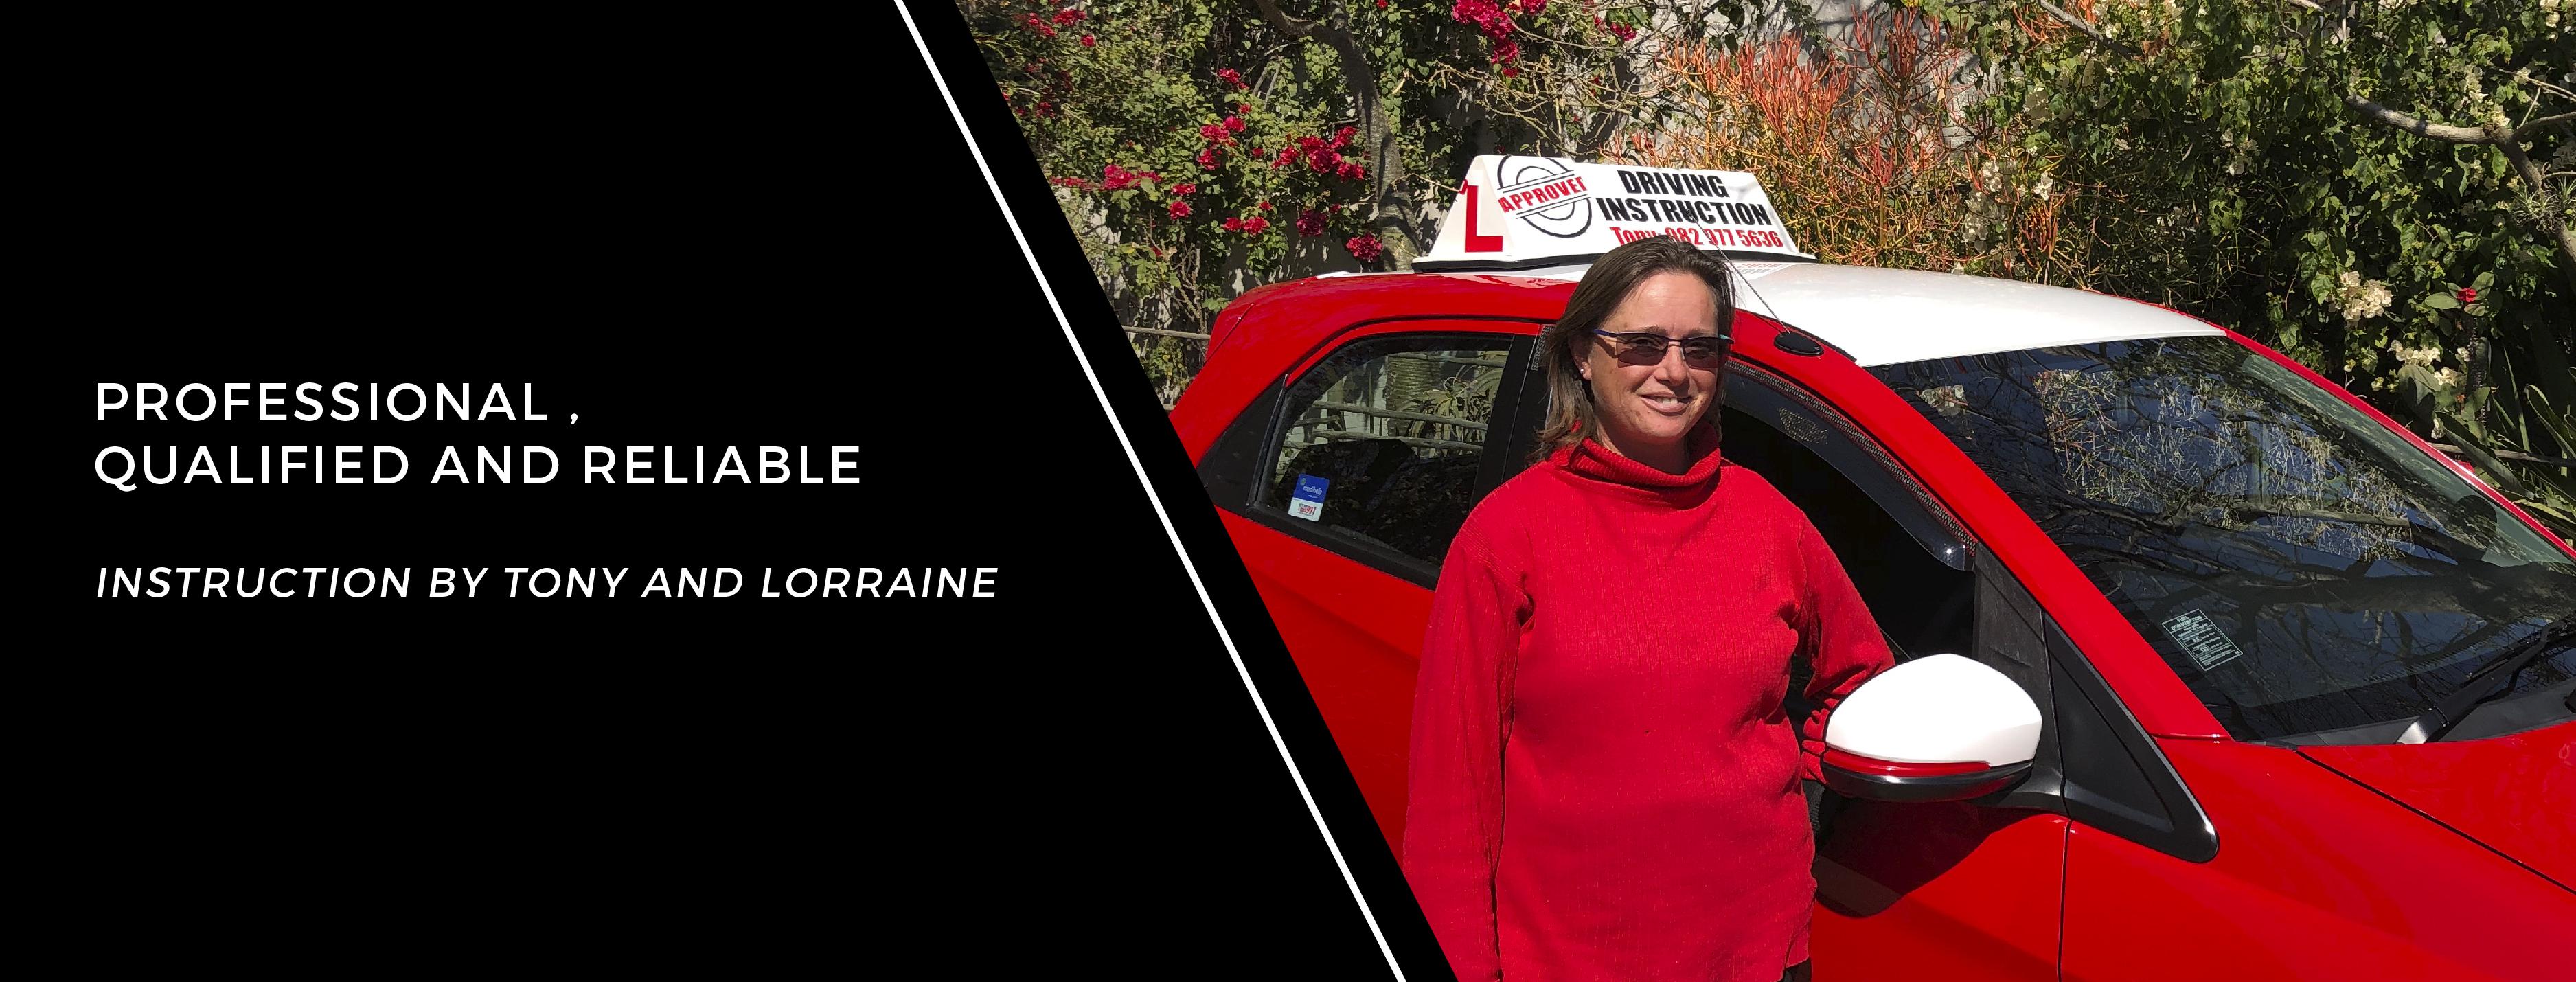 Lorraine 09